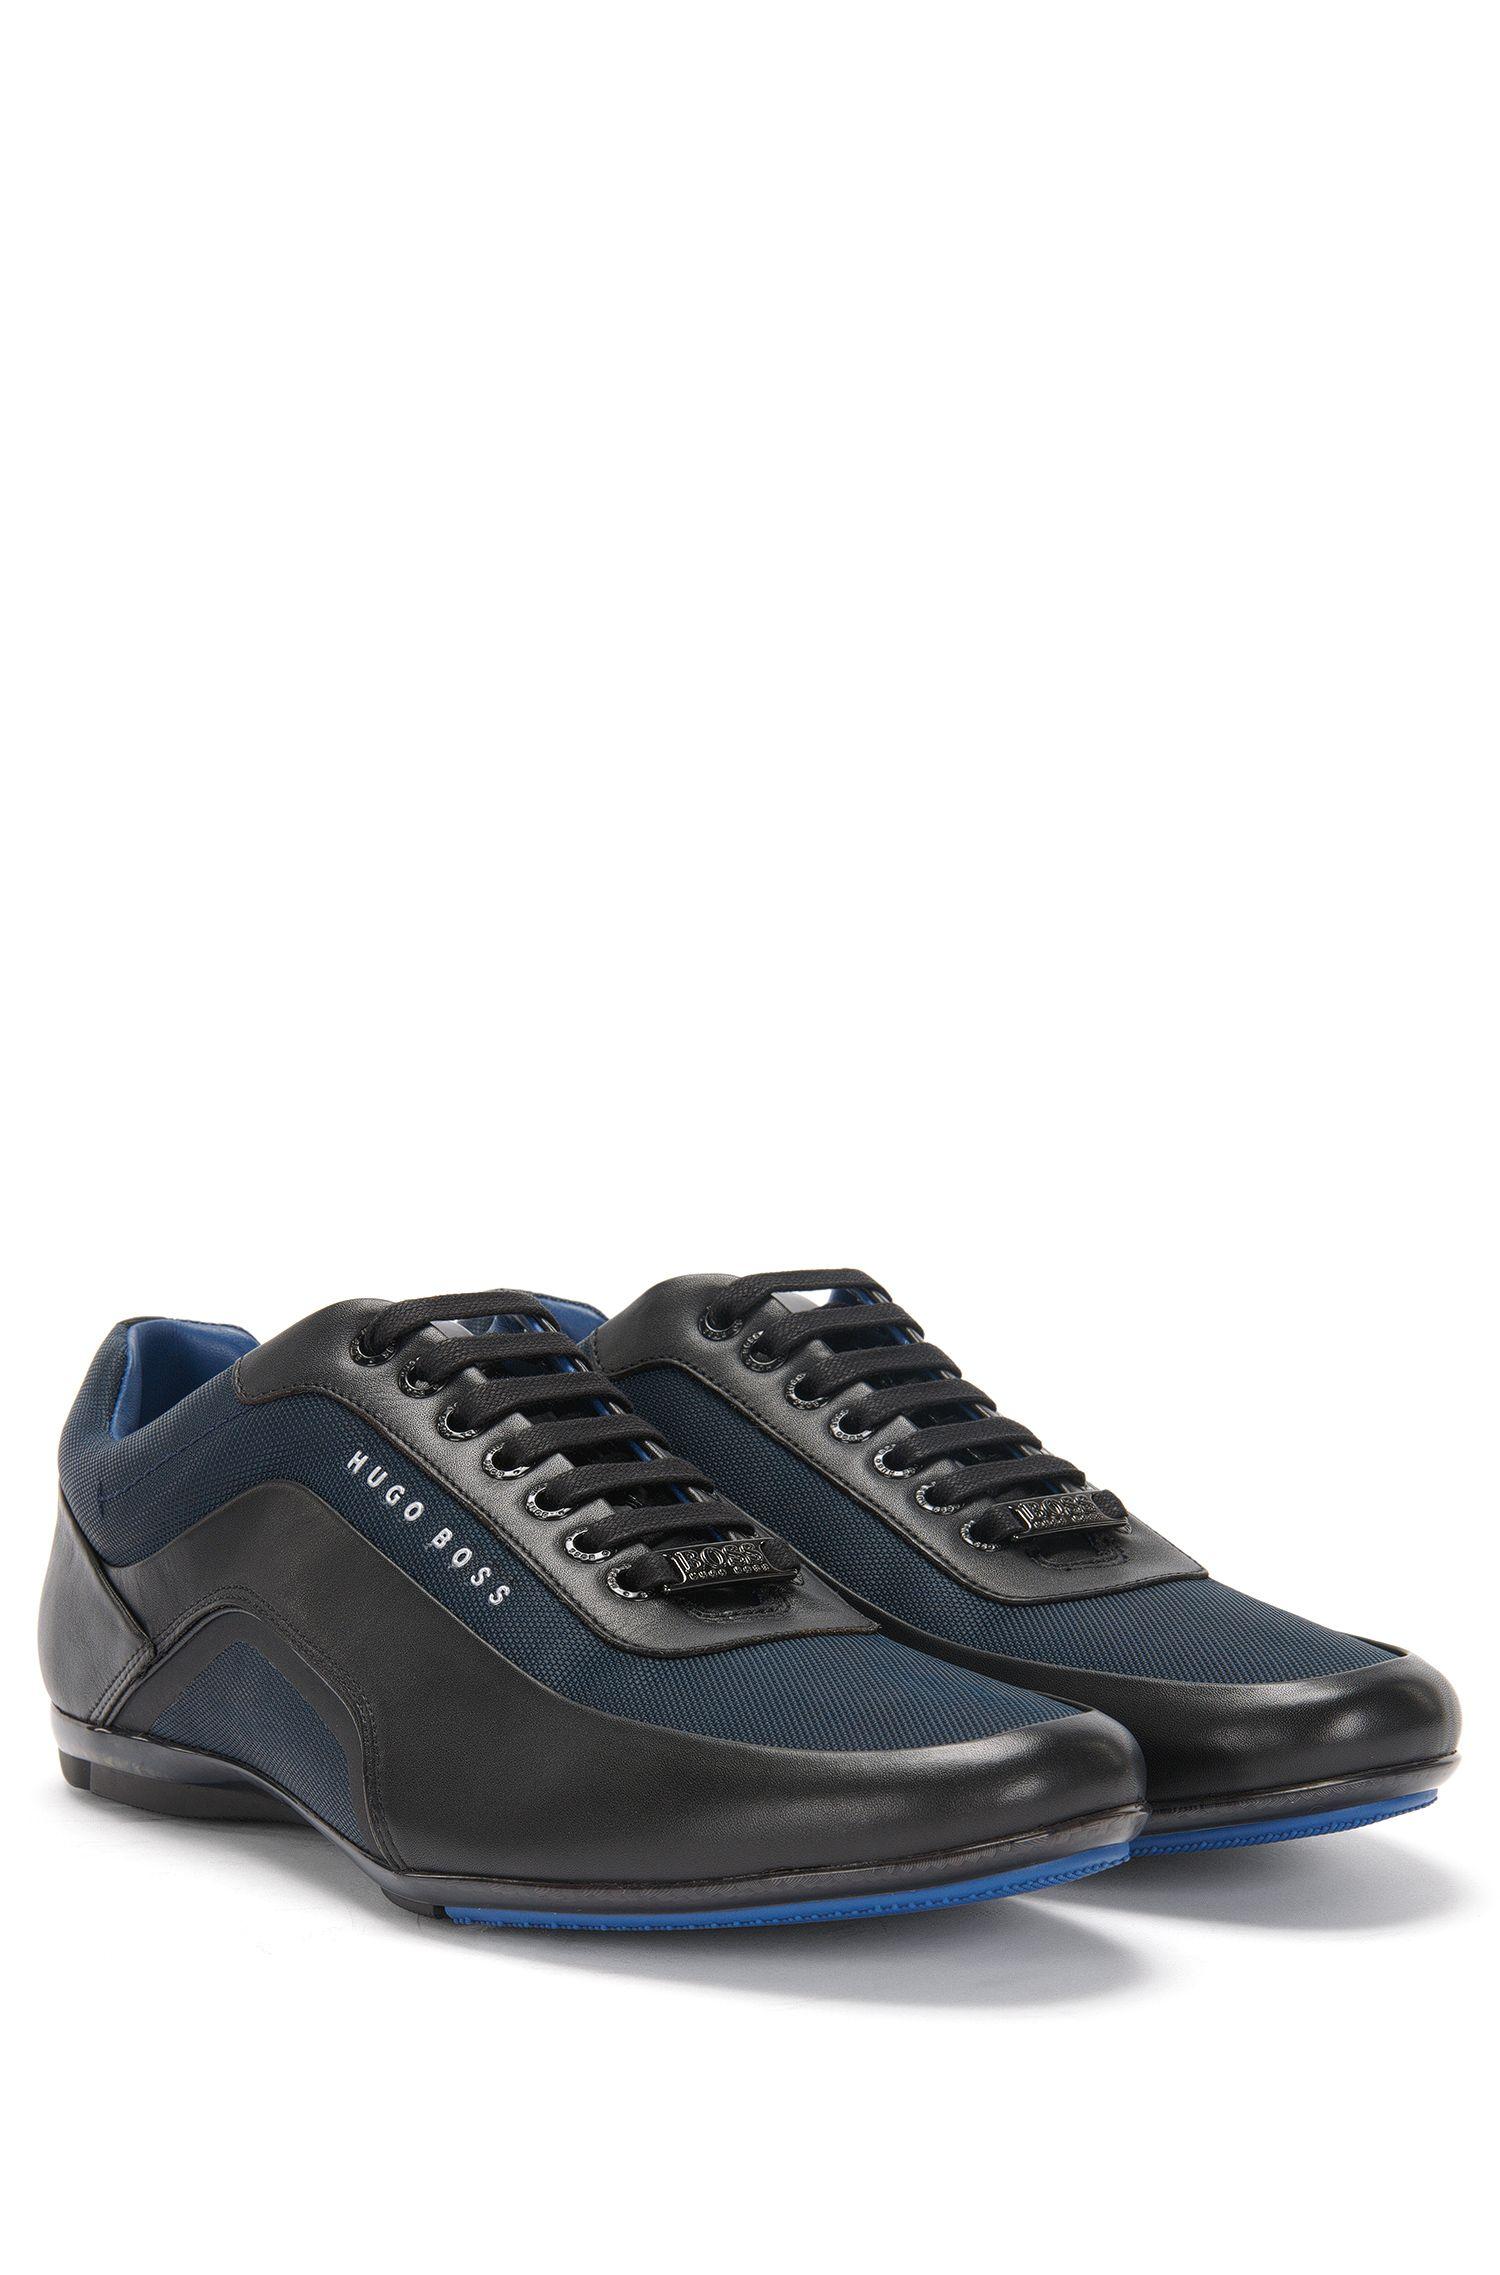 Leder-Sneakers mit Carbon-Fasern: Hbracing_Lowp_ltny'